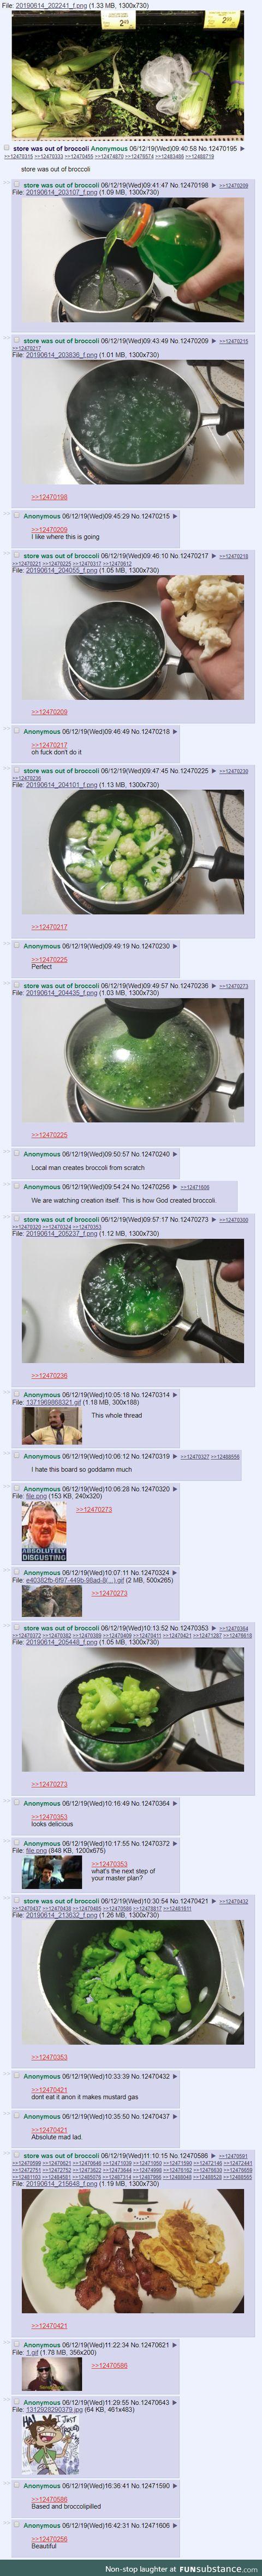 /ck/ wants broccoli